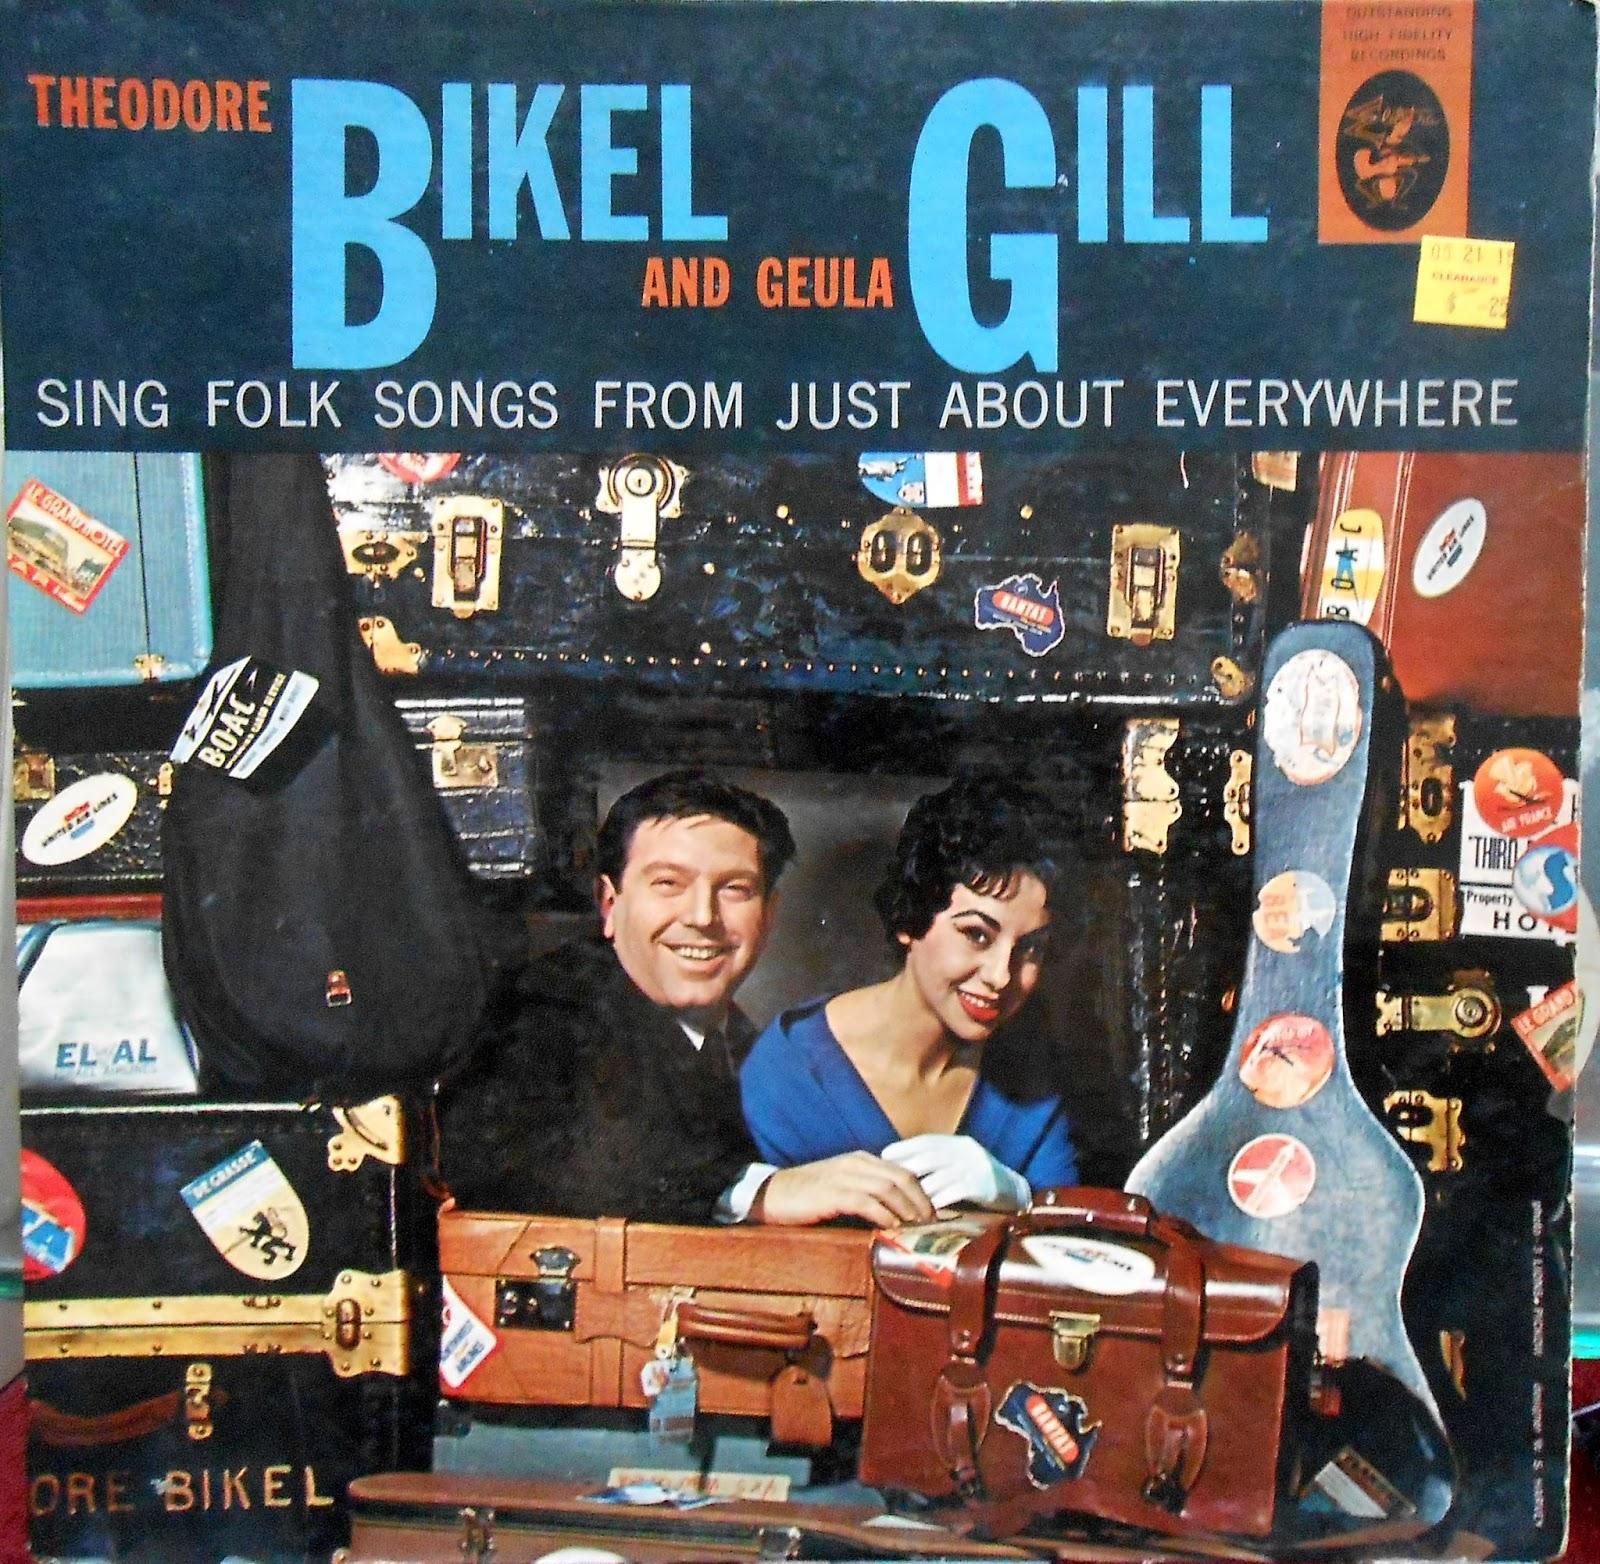 Theodore Bikel On Tour